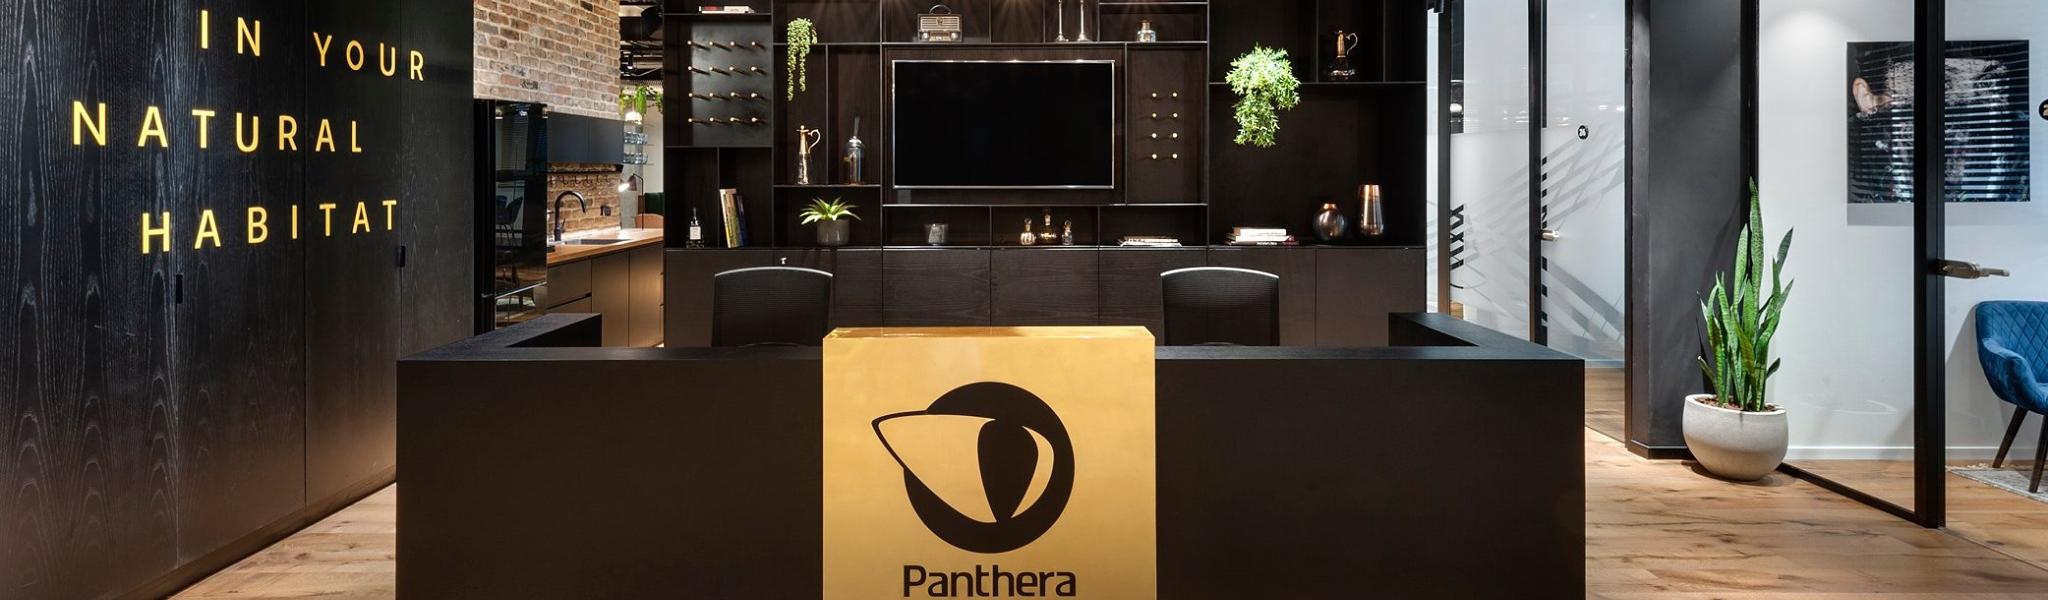 spacenter.co .il פנתרה Panthera 4